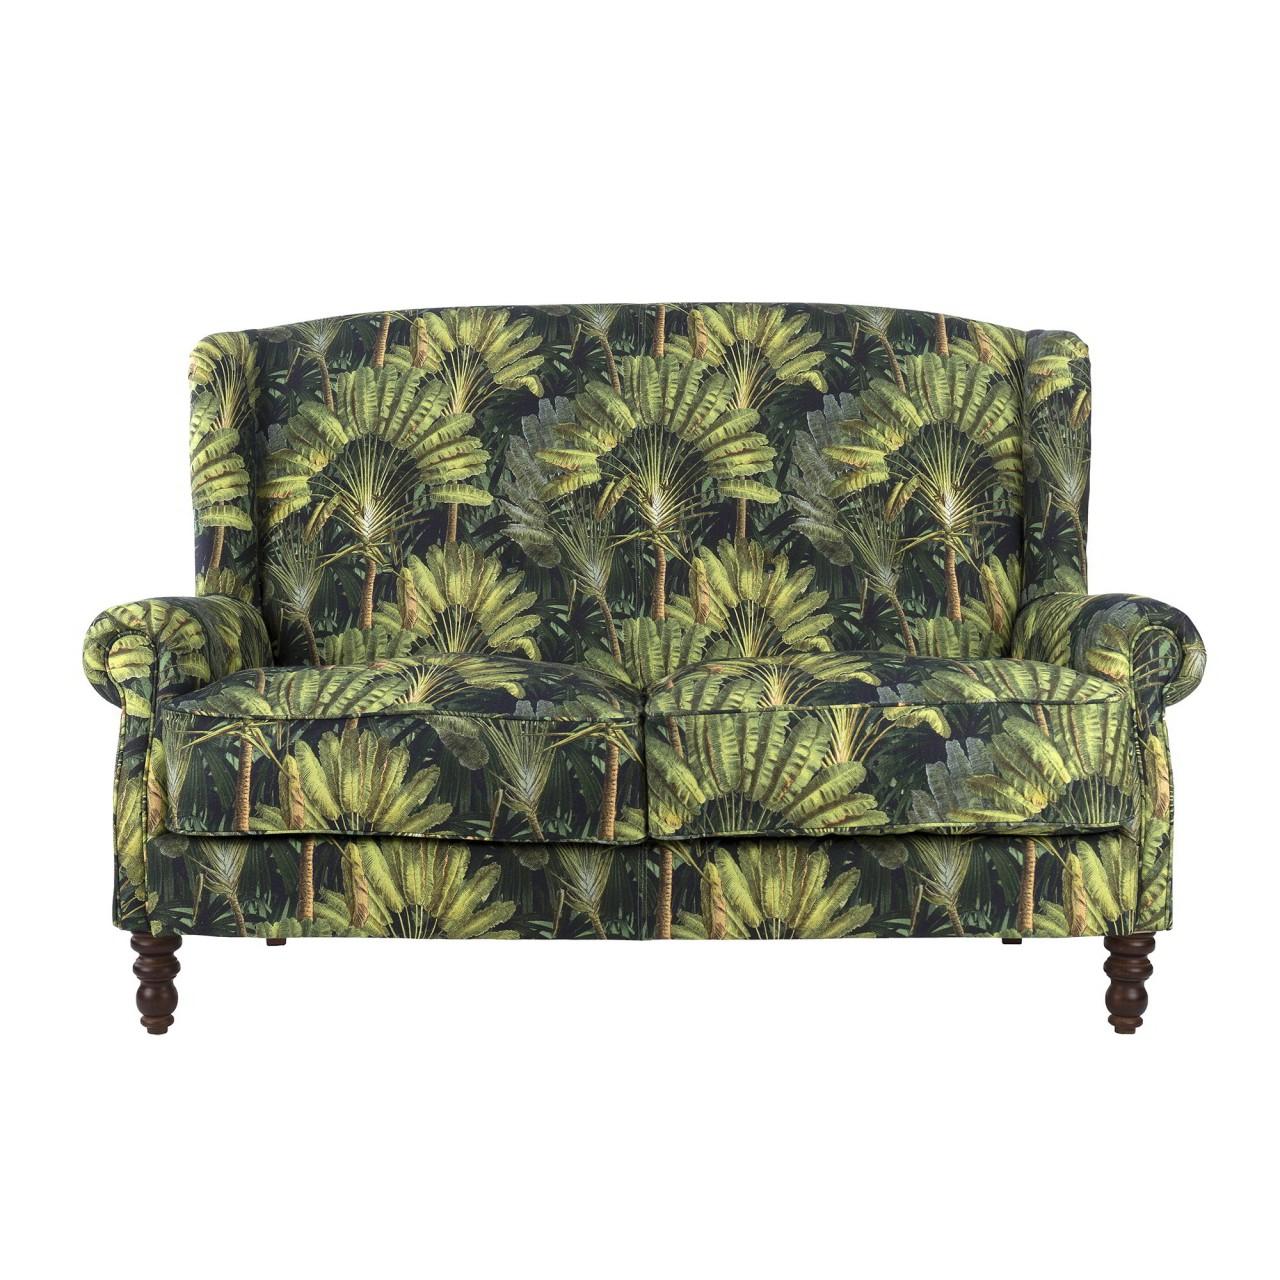 Newest Setoril Modern Sectional Sofa Swith Chaise Woven Linen Regarding Abigail Sofa – Traveller's Palm Linen – Sofas – Furniture (View 19 of 20)